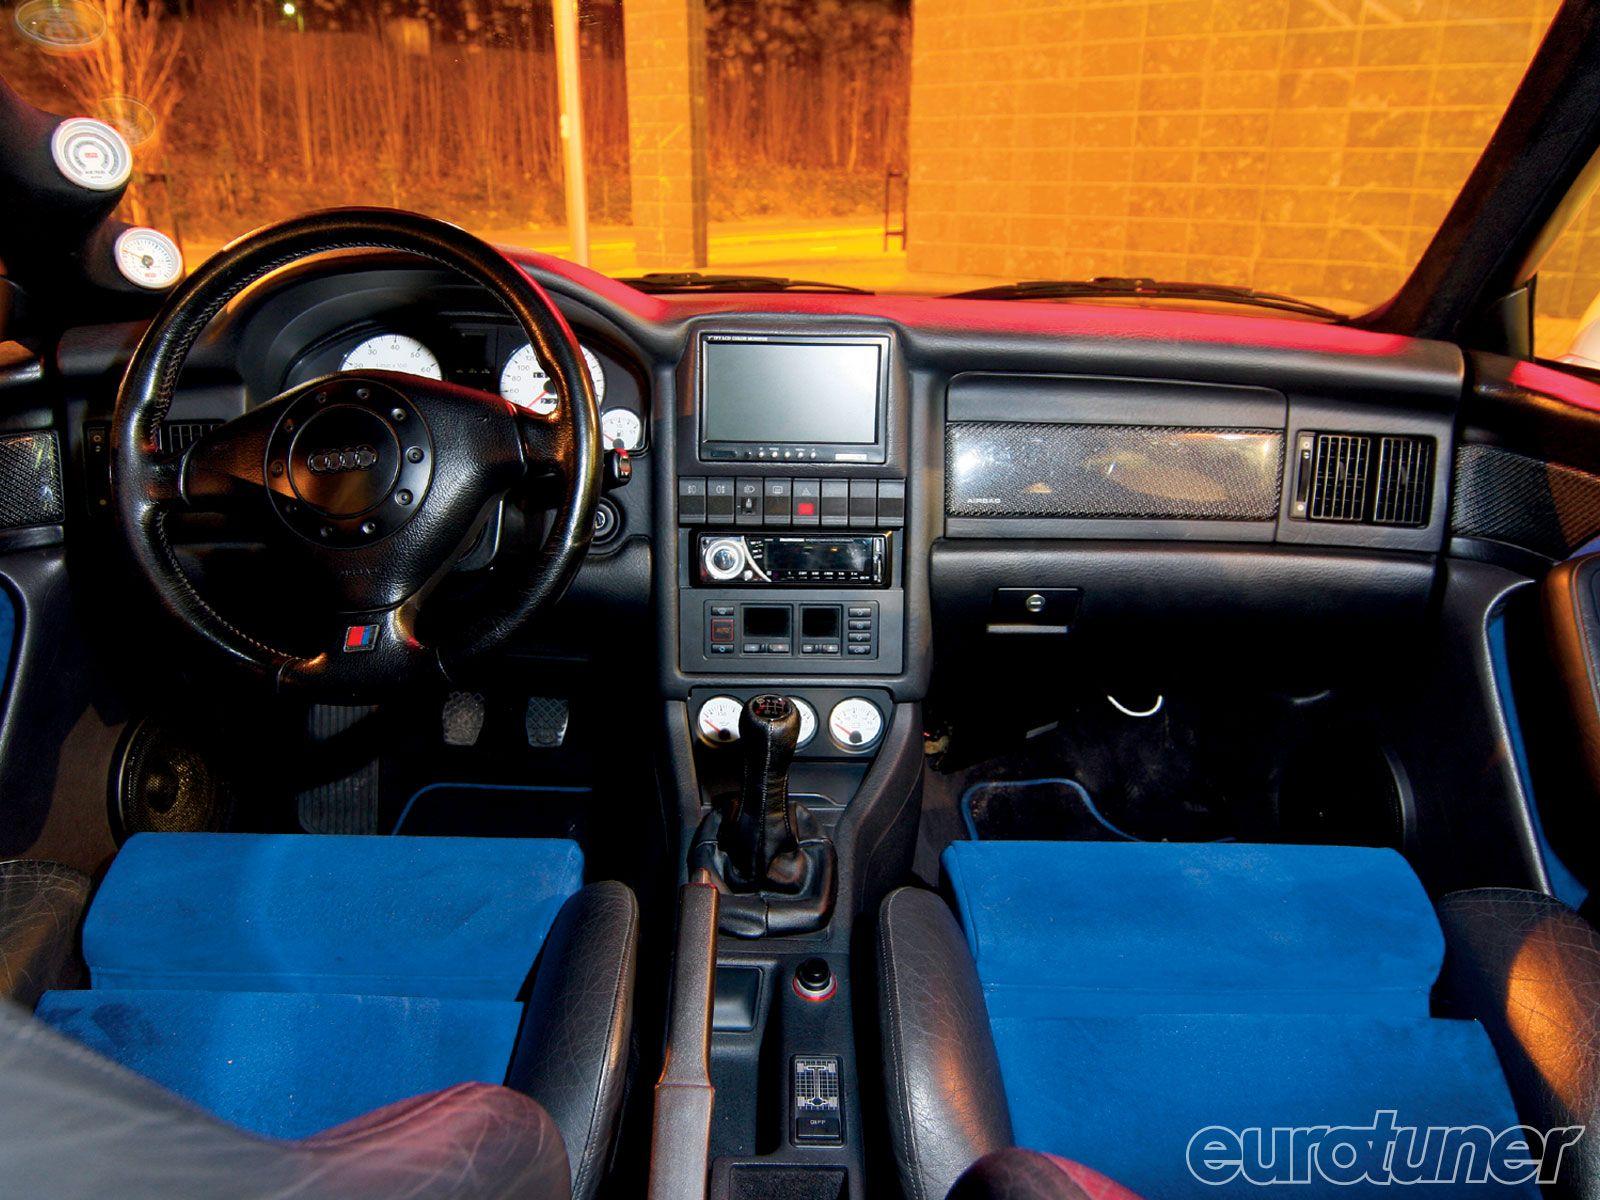 Rally Audi S2 Interior Wwwmiifotoscom